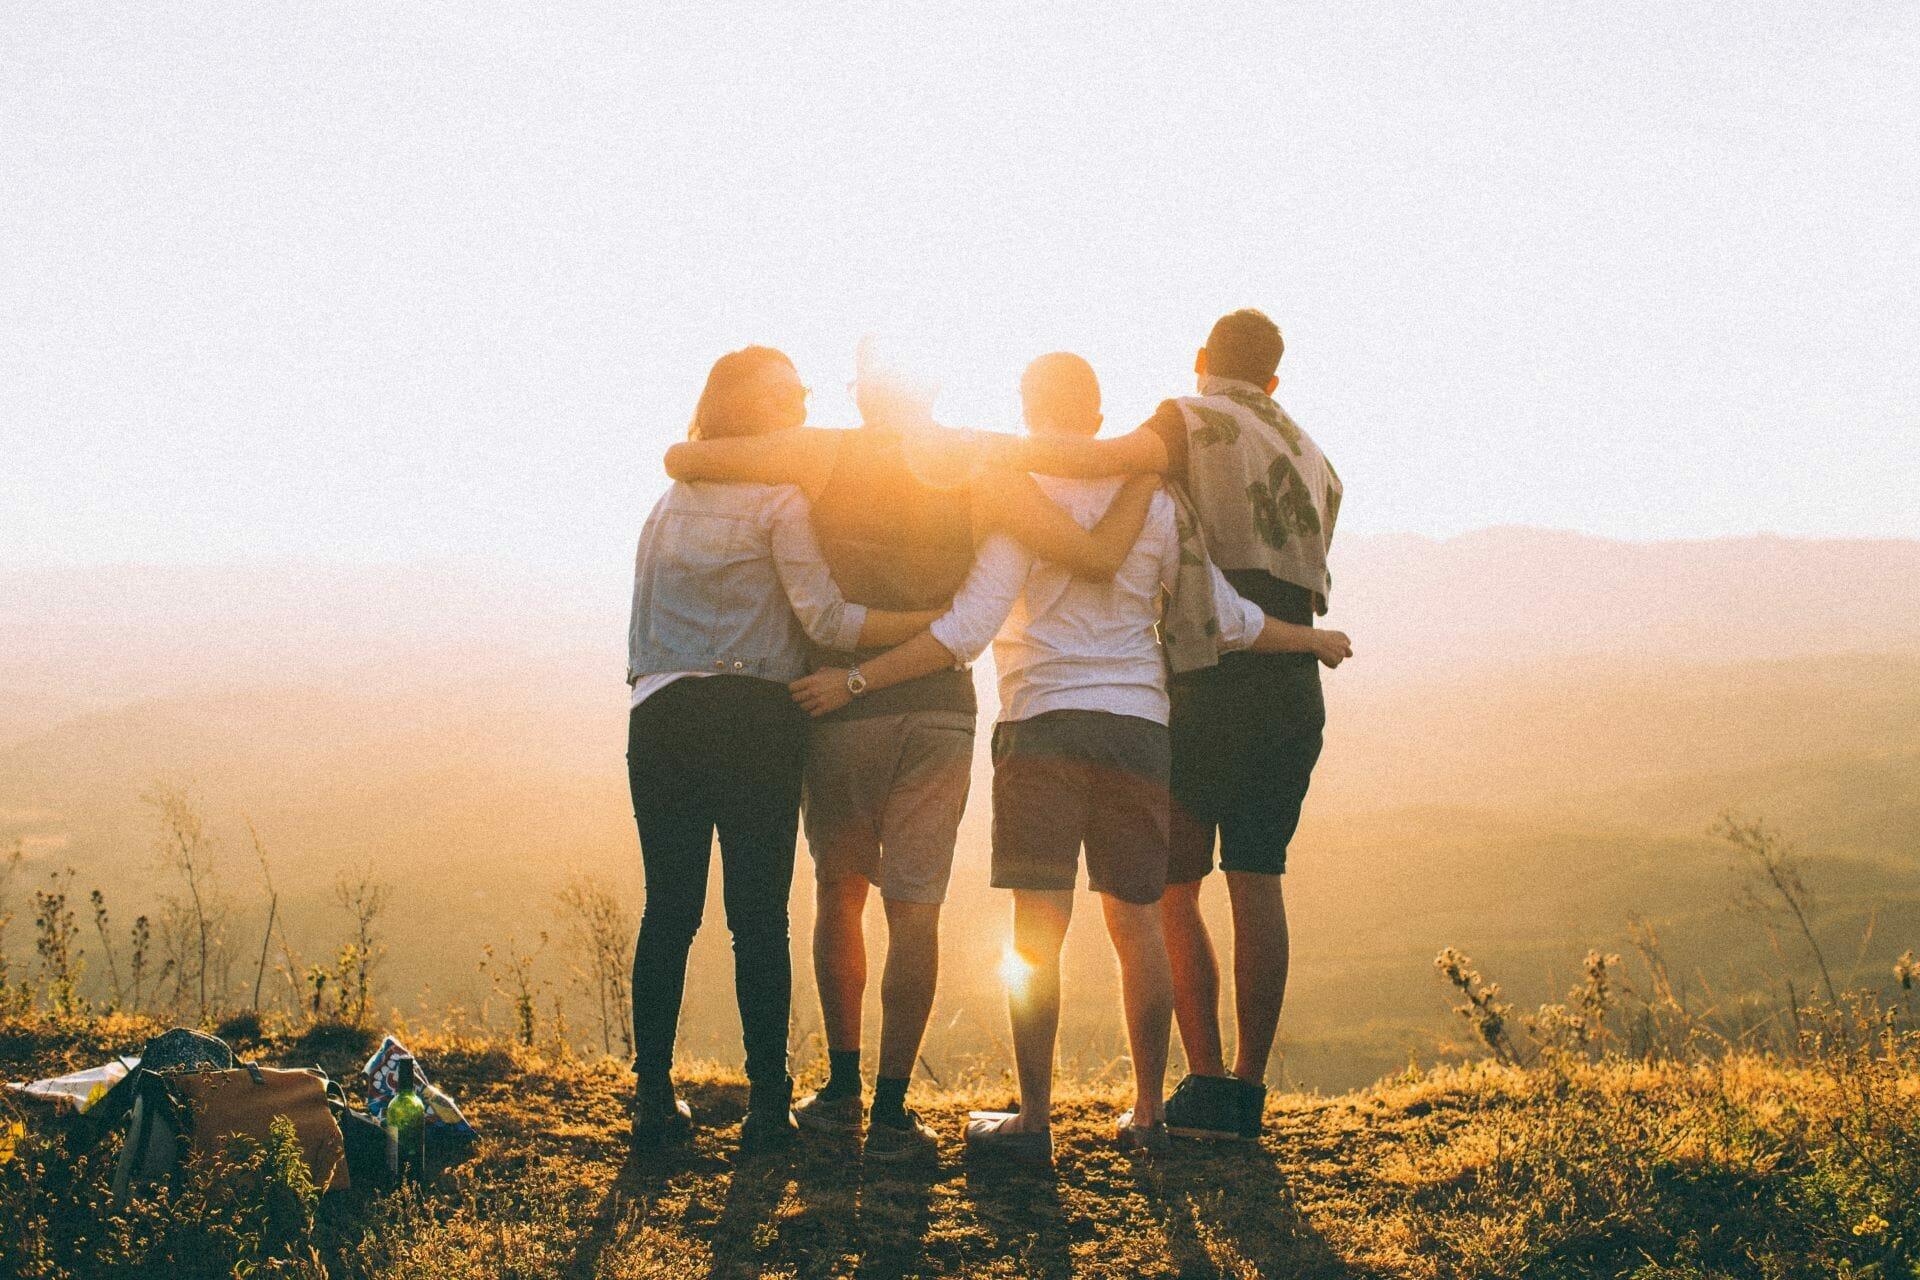 7 Types of People the World Needs More Of via @allamericanatlas